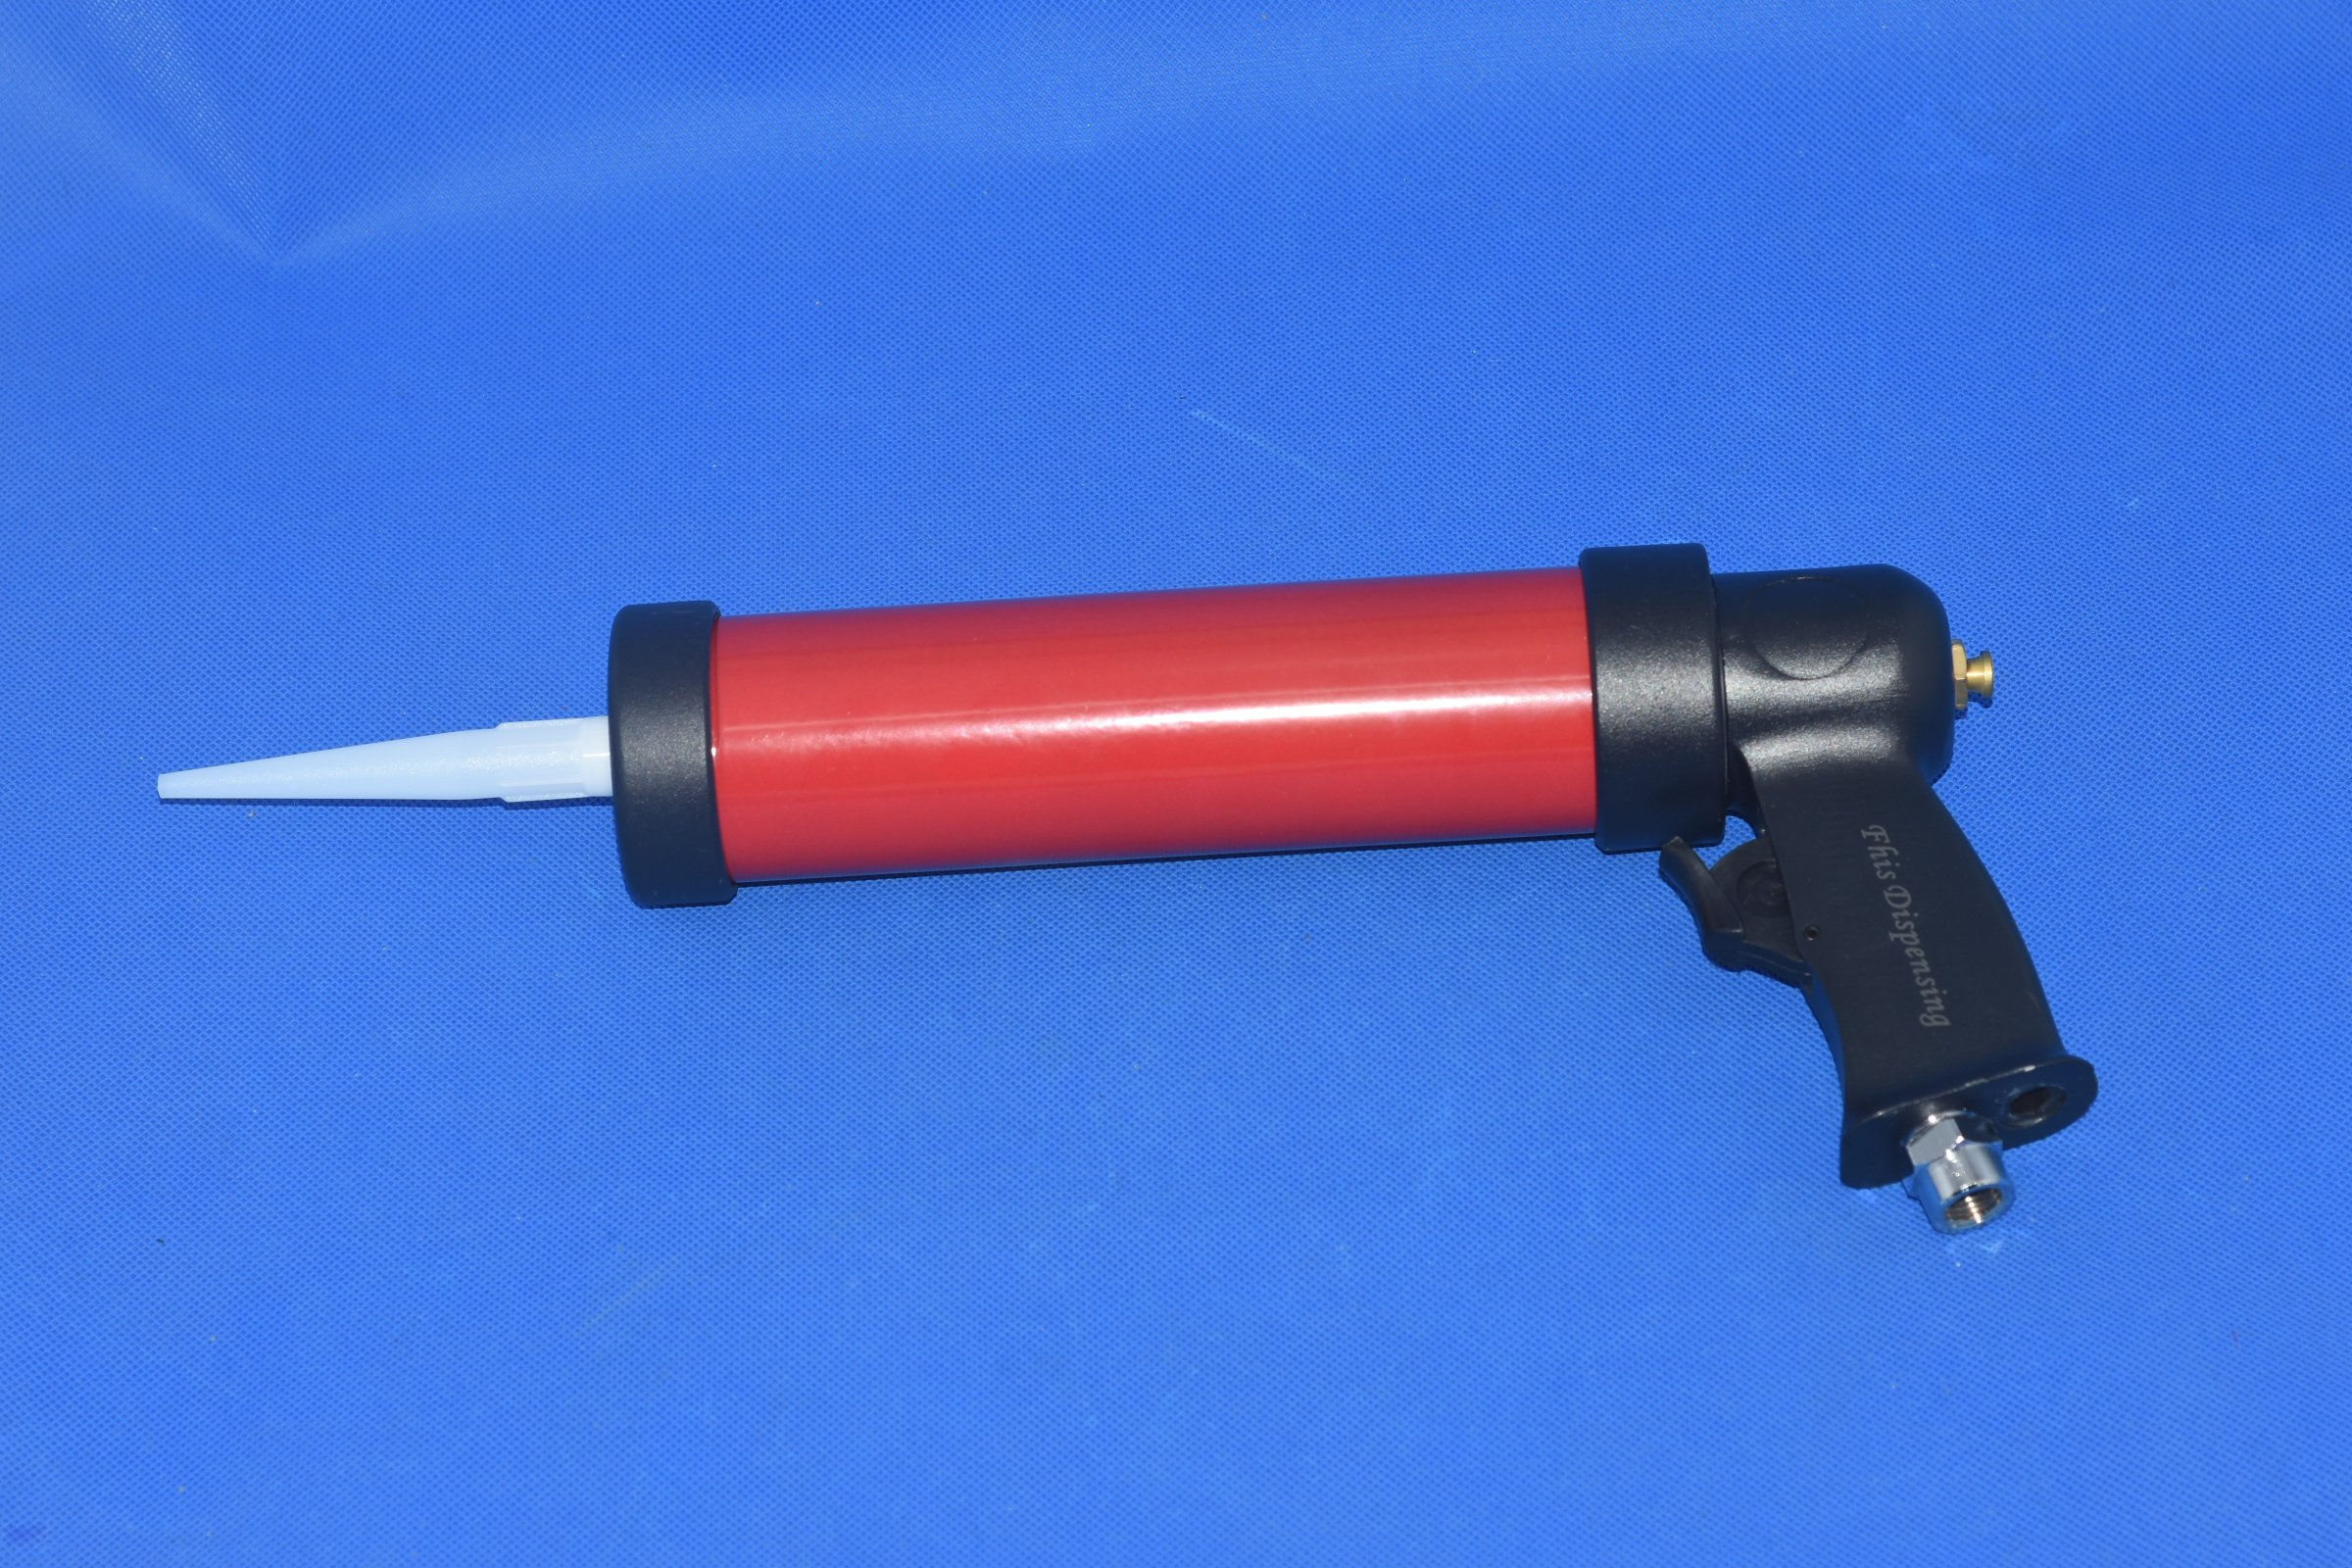 Pneumatic caulking glass glue gun 310ml 1pcs + cartridge 1pcs